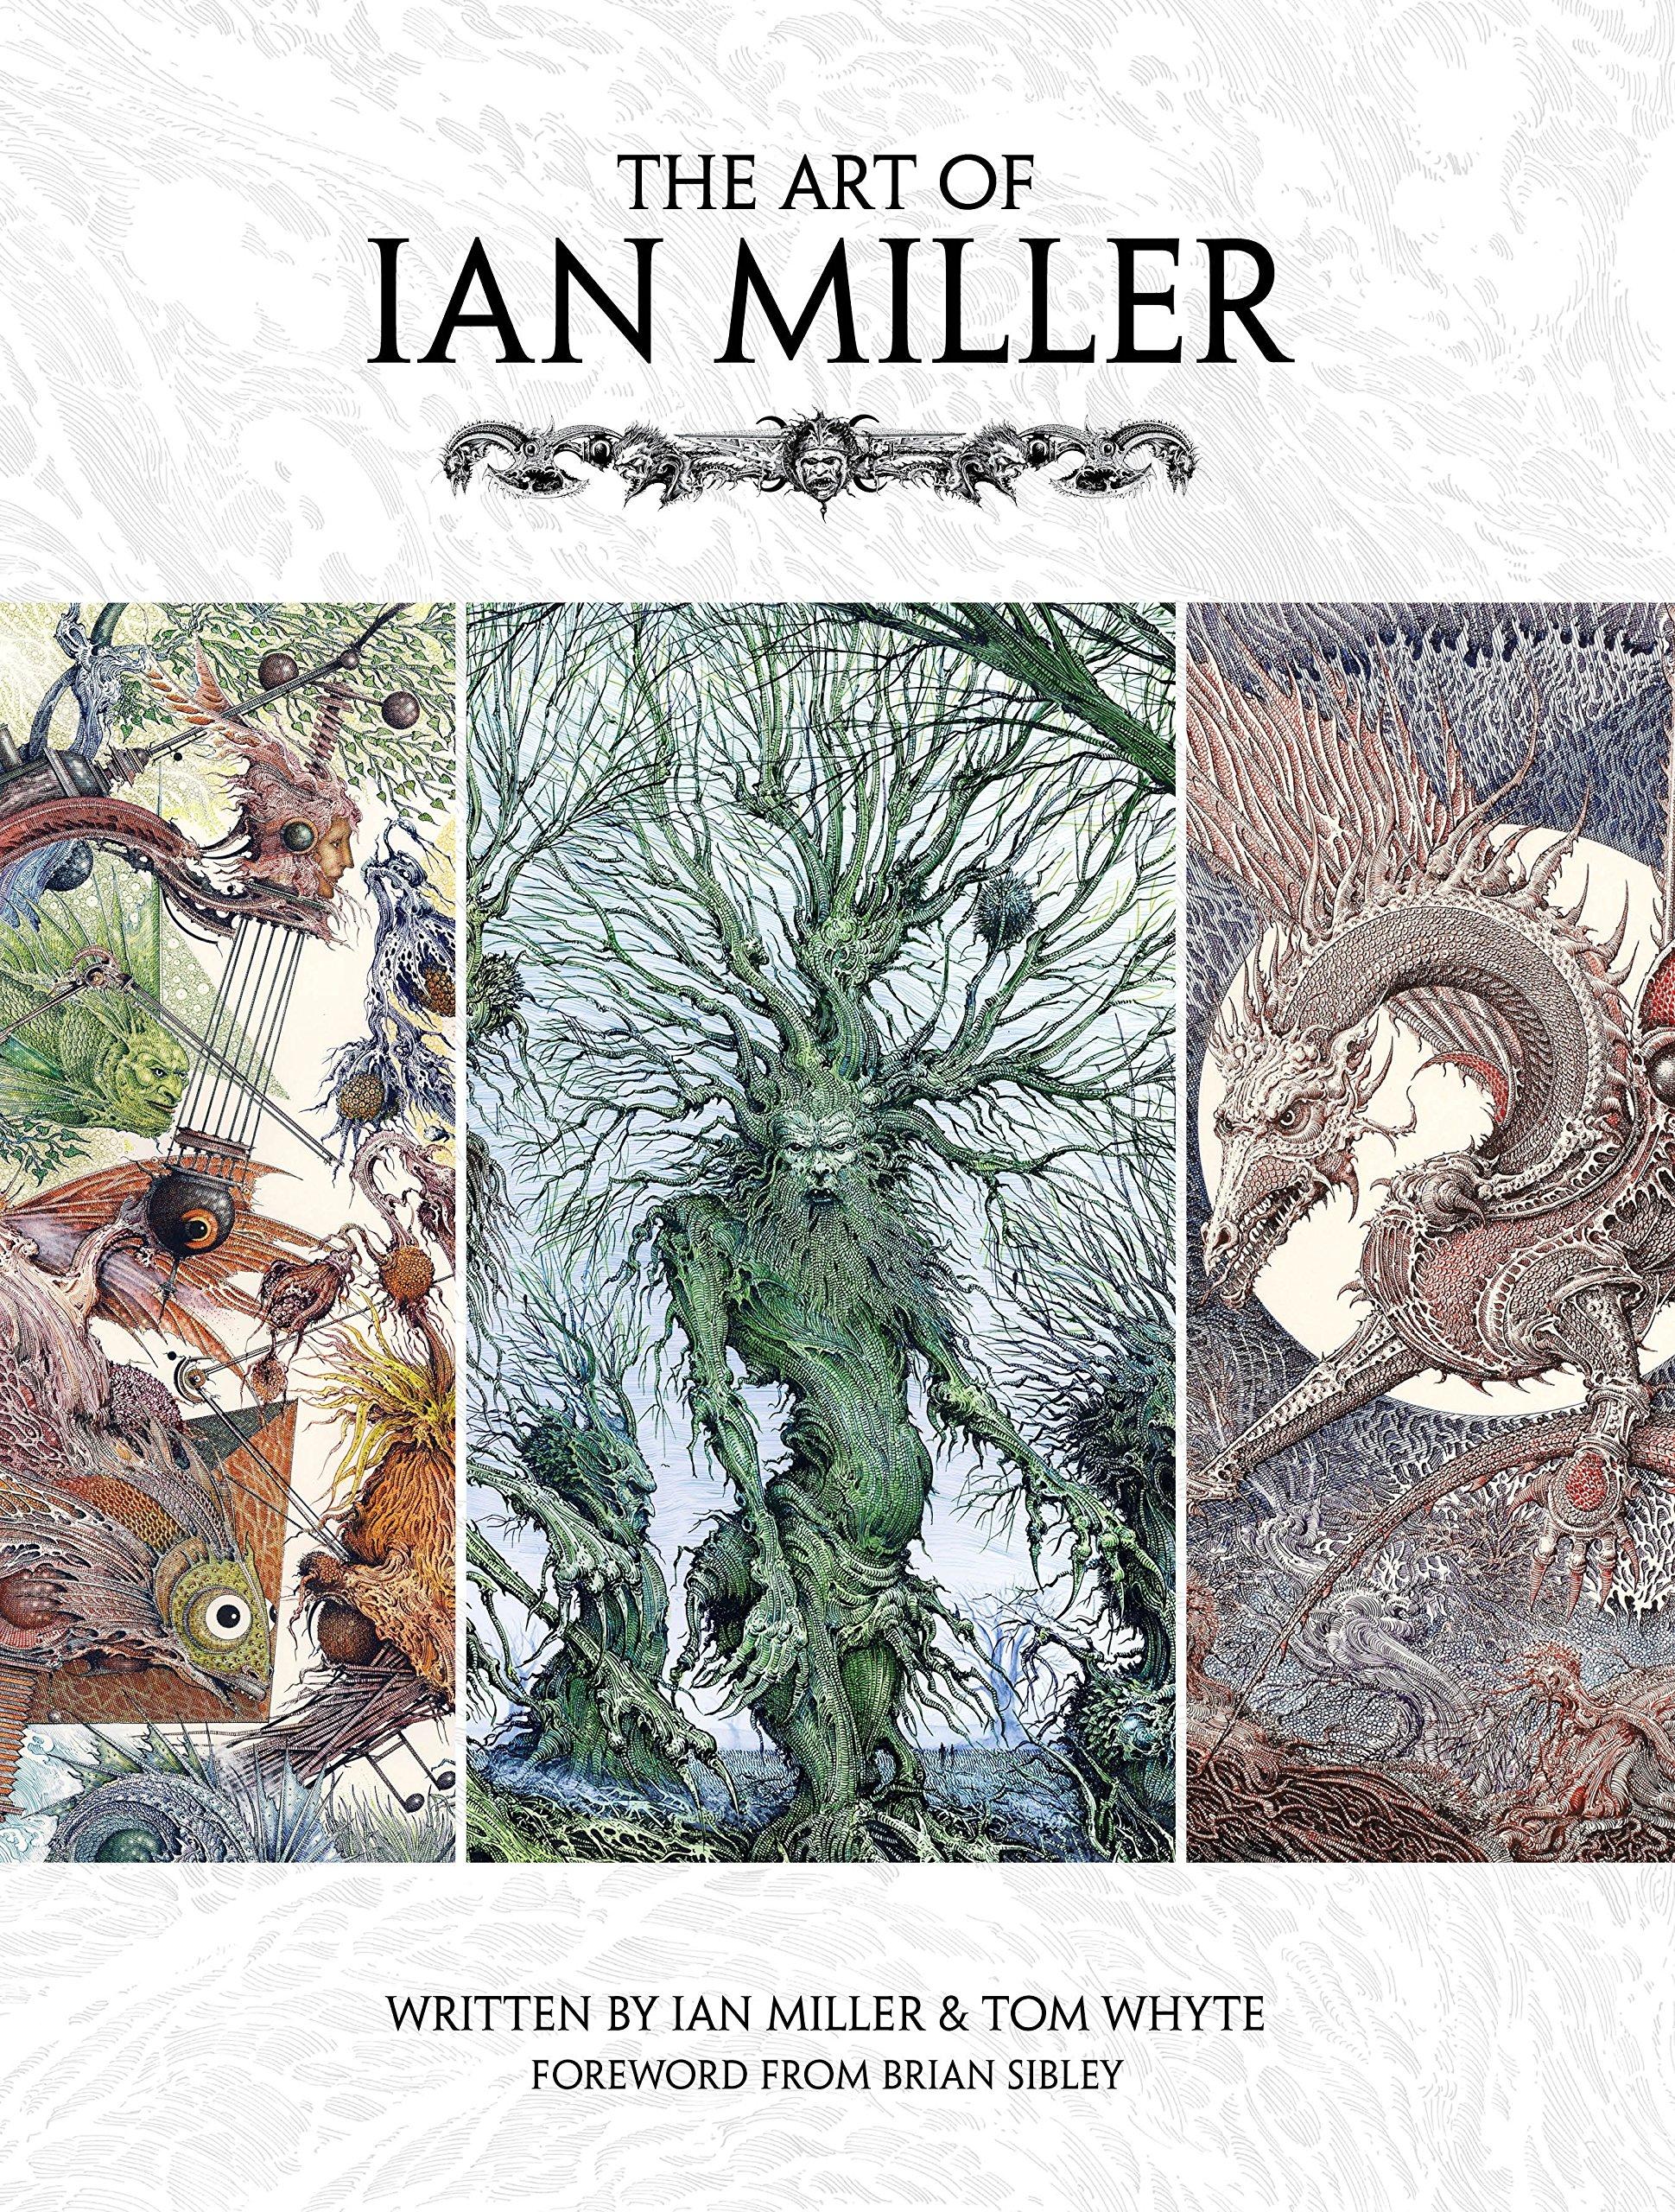 The Art of Ian Miller by Titan Books